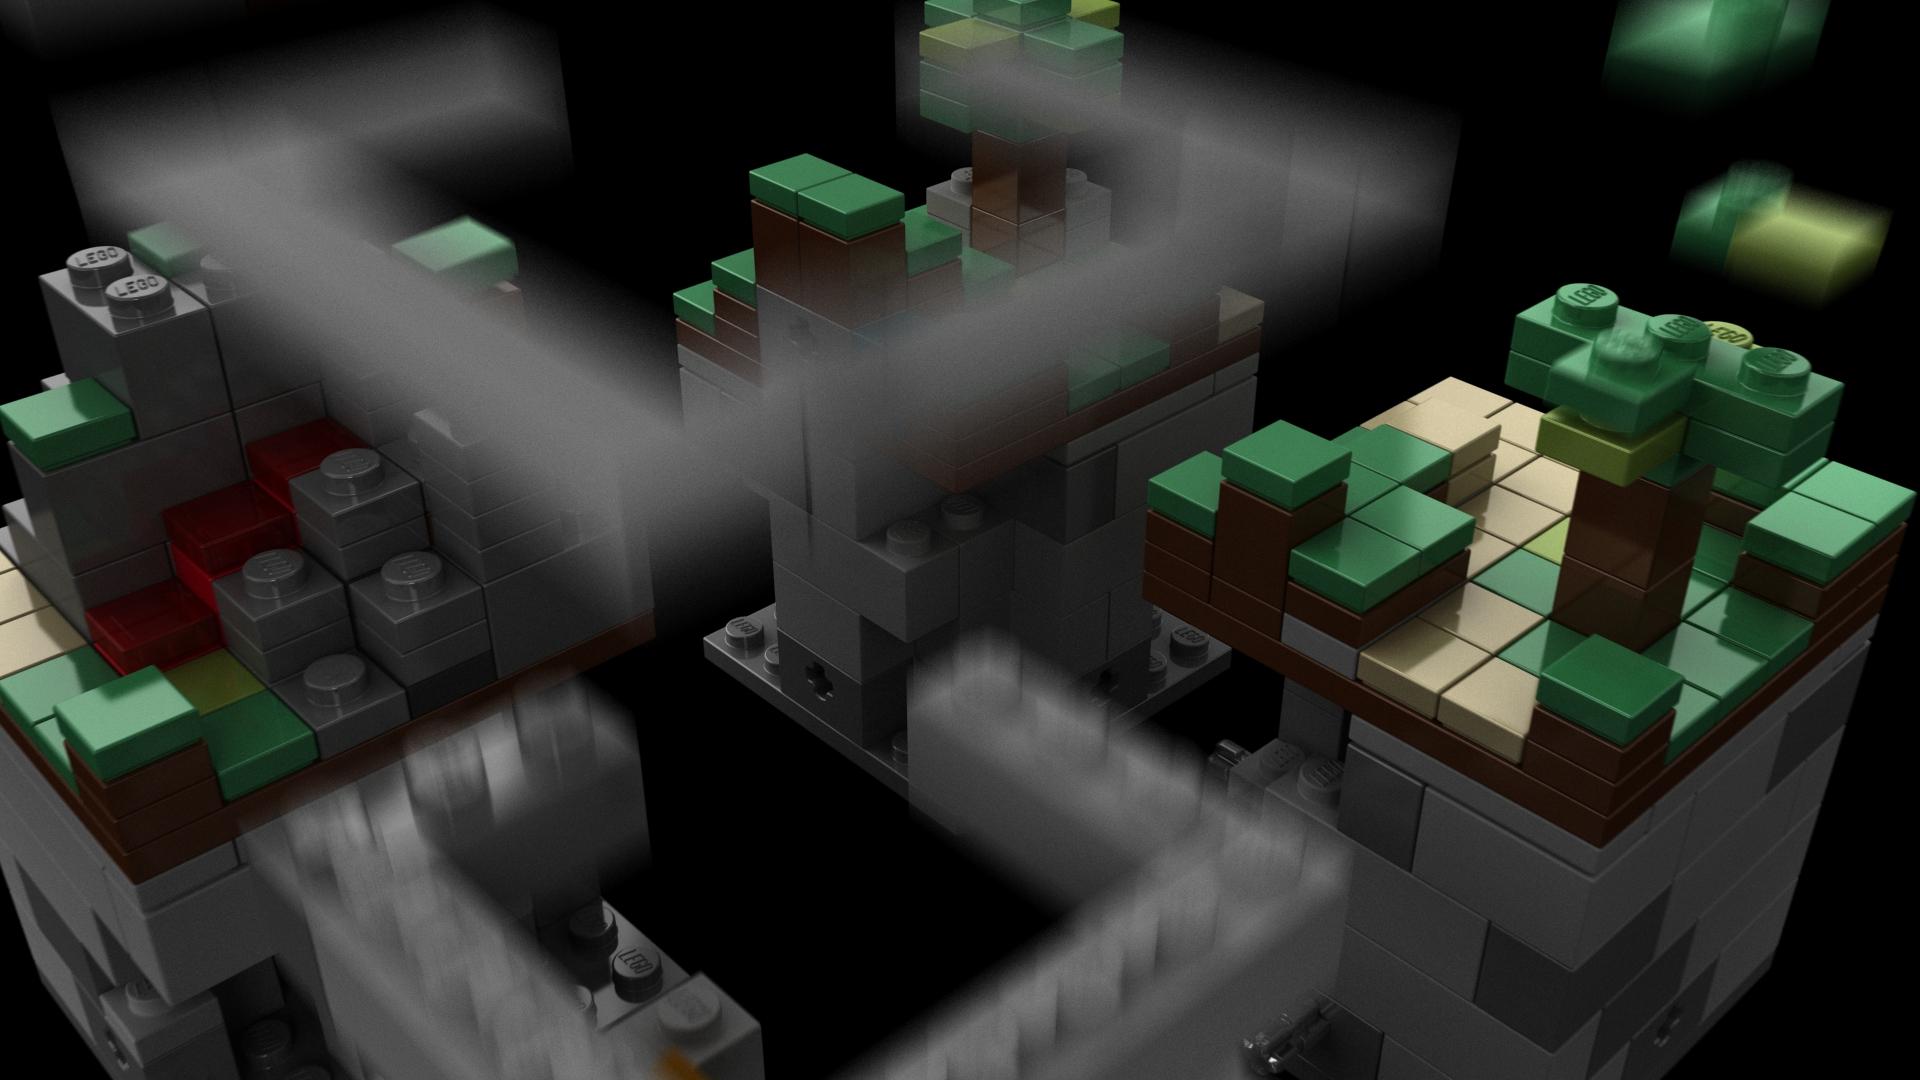 lego_minecraft_0052